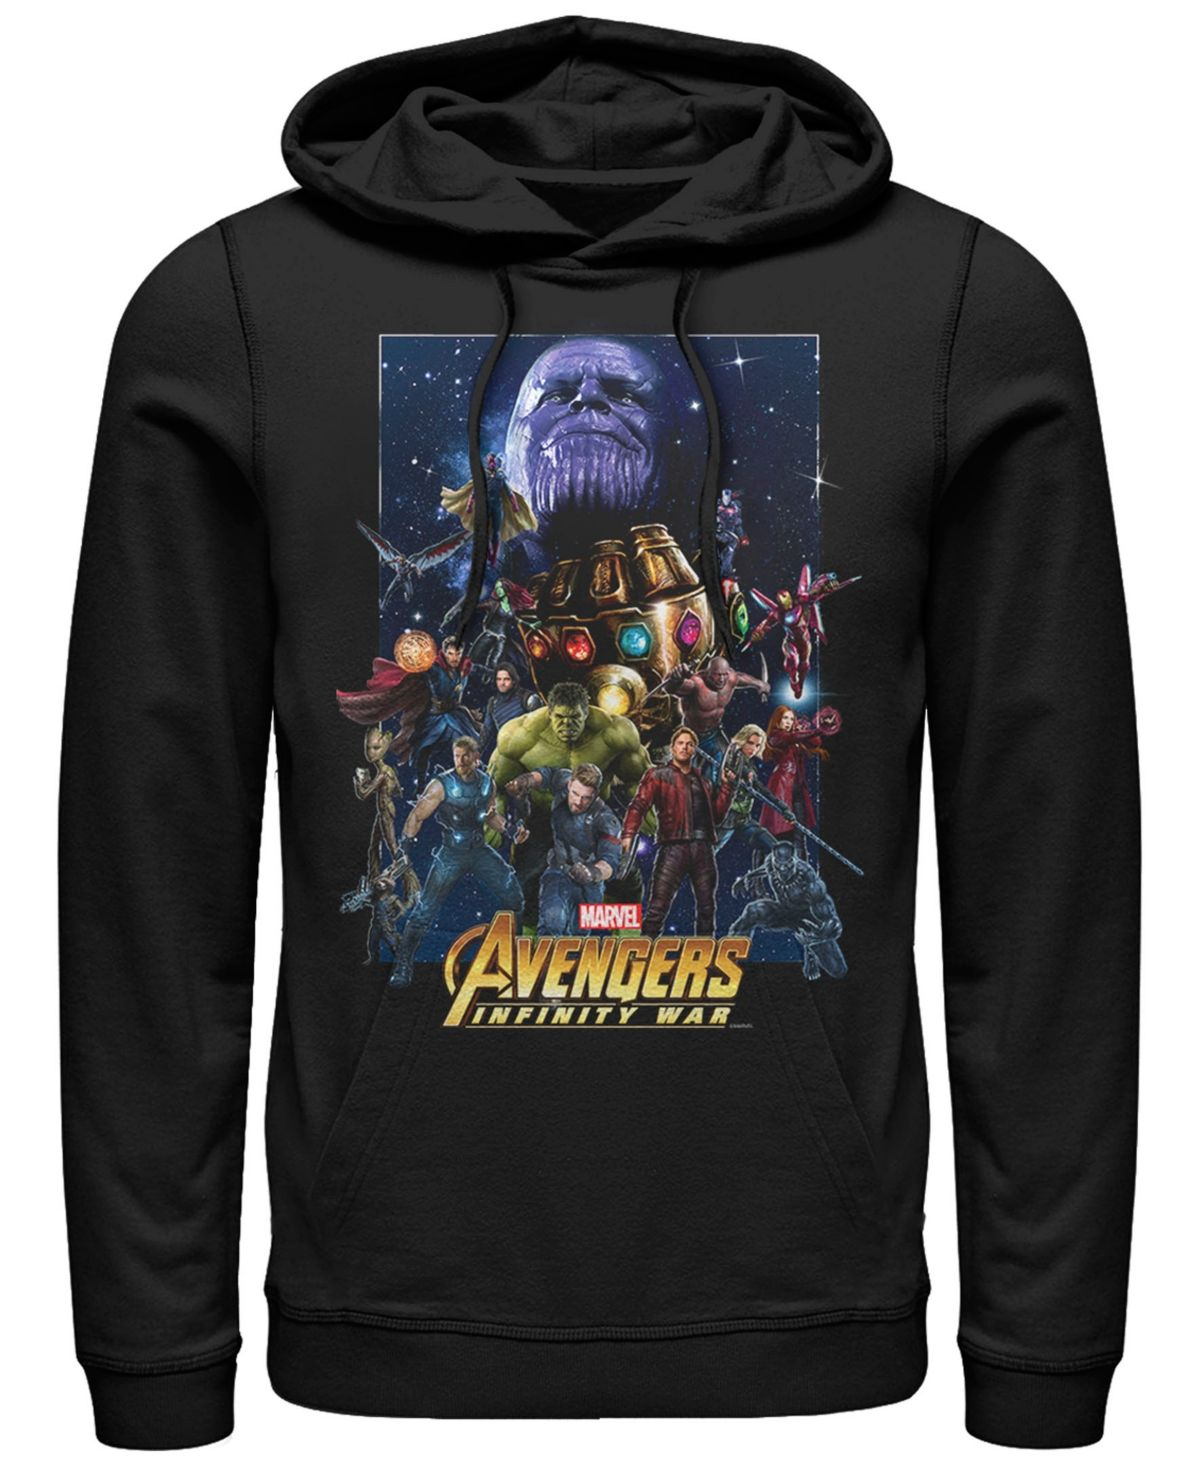 Bestel een Avengers Infinity War Avengers Team trui op